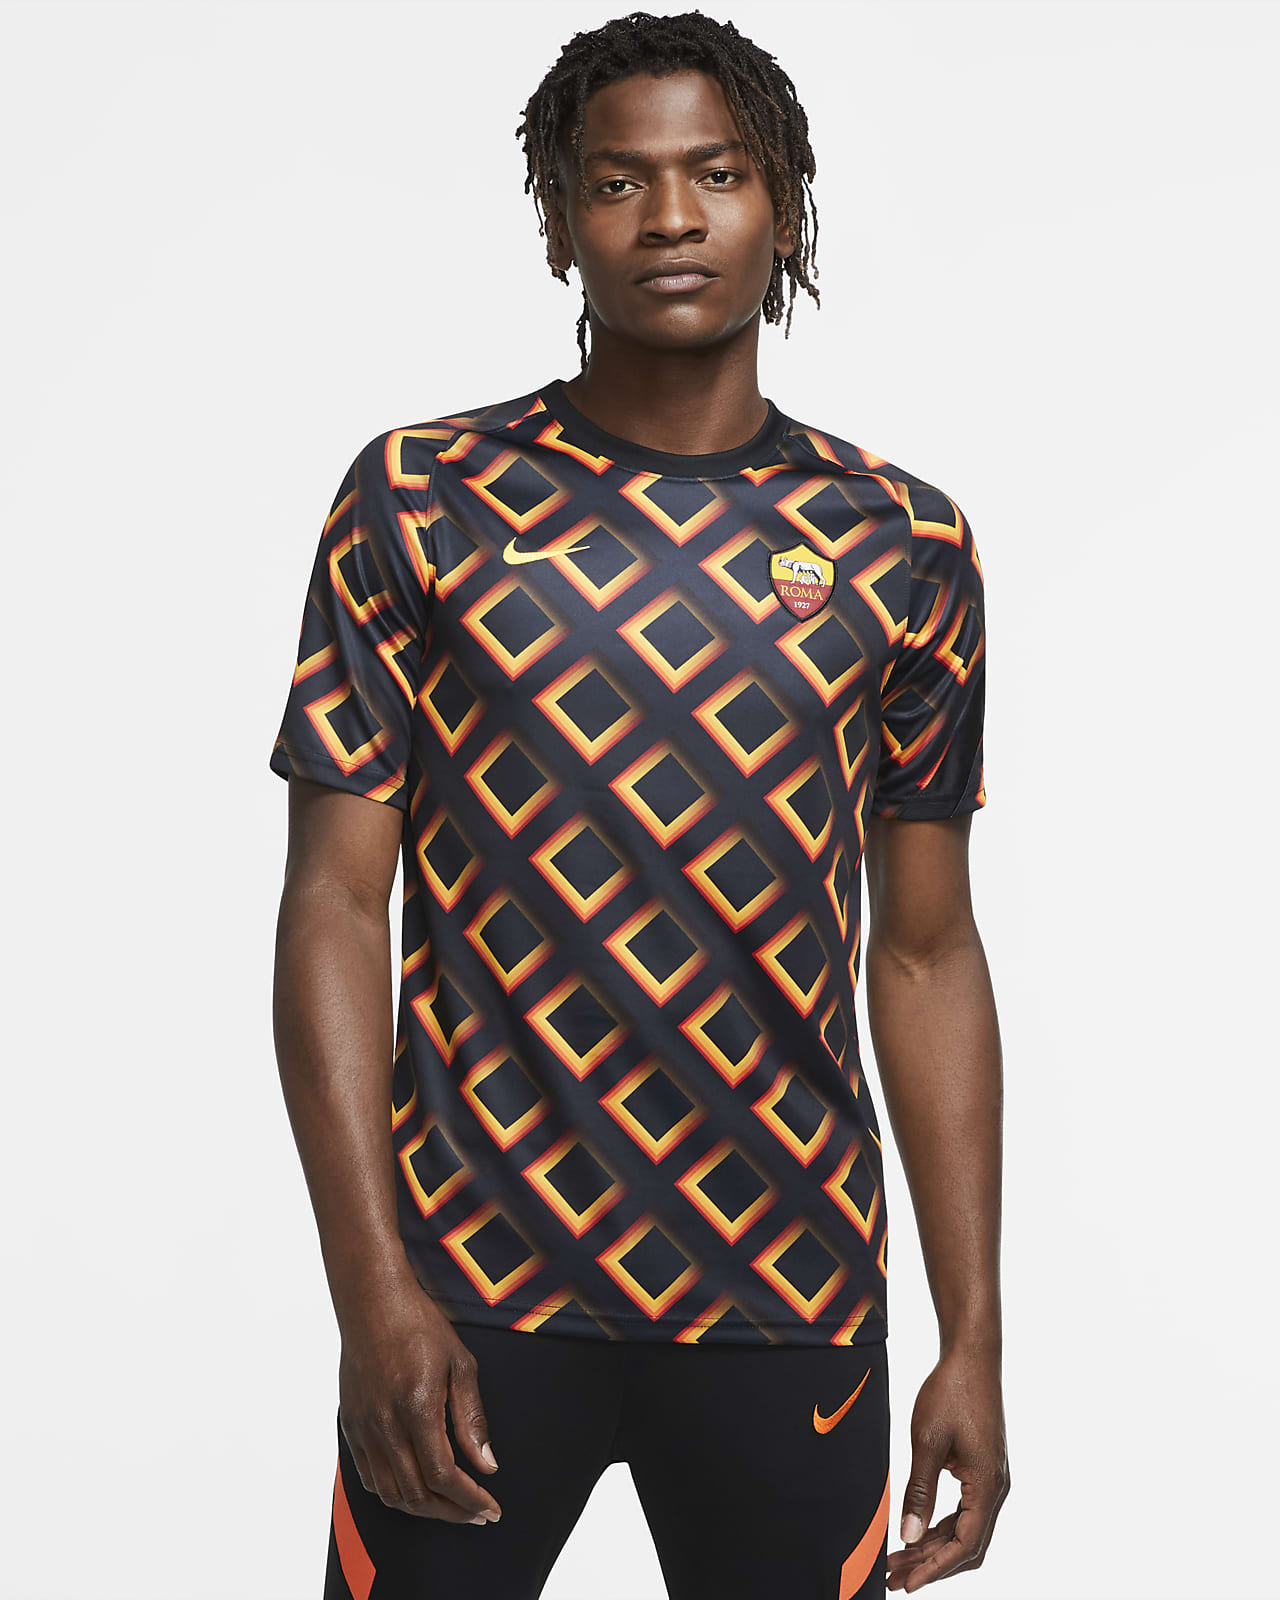 AS Roma Men's Short-Sleeve Football Top